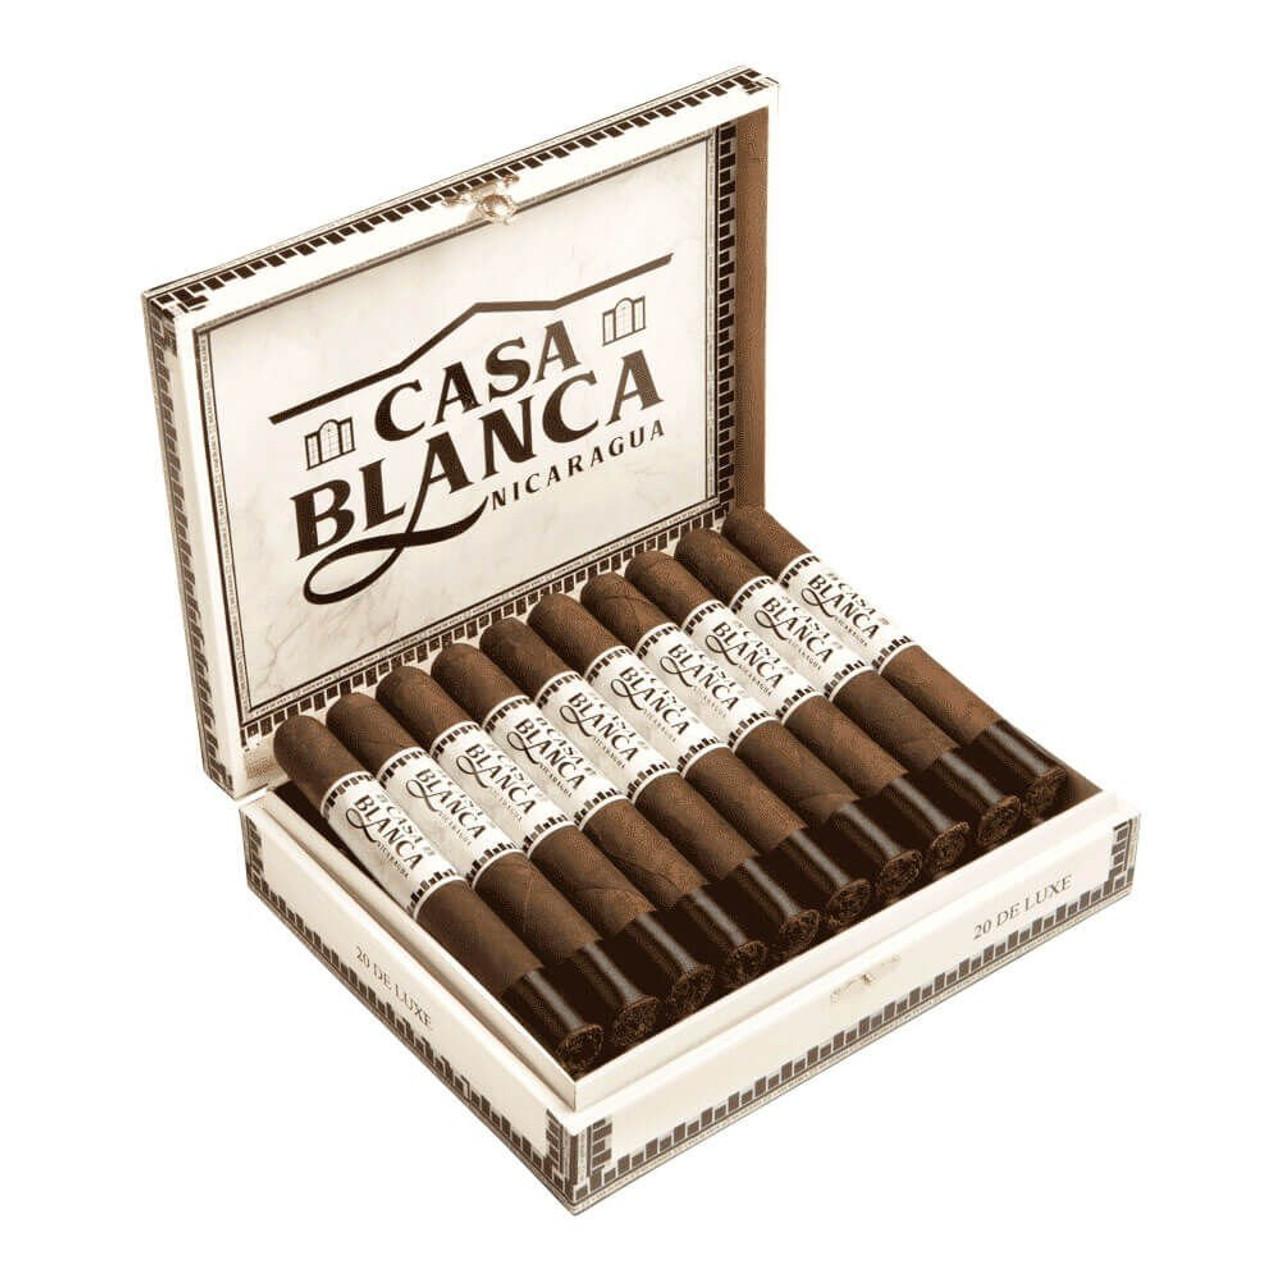 Casa Blanca Nicaragua President Maduro Cigars - 7.5 x 50 (Box of 20)